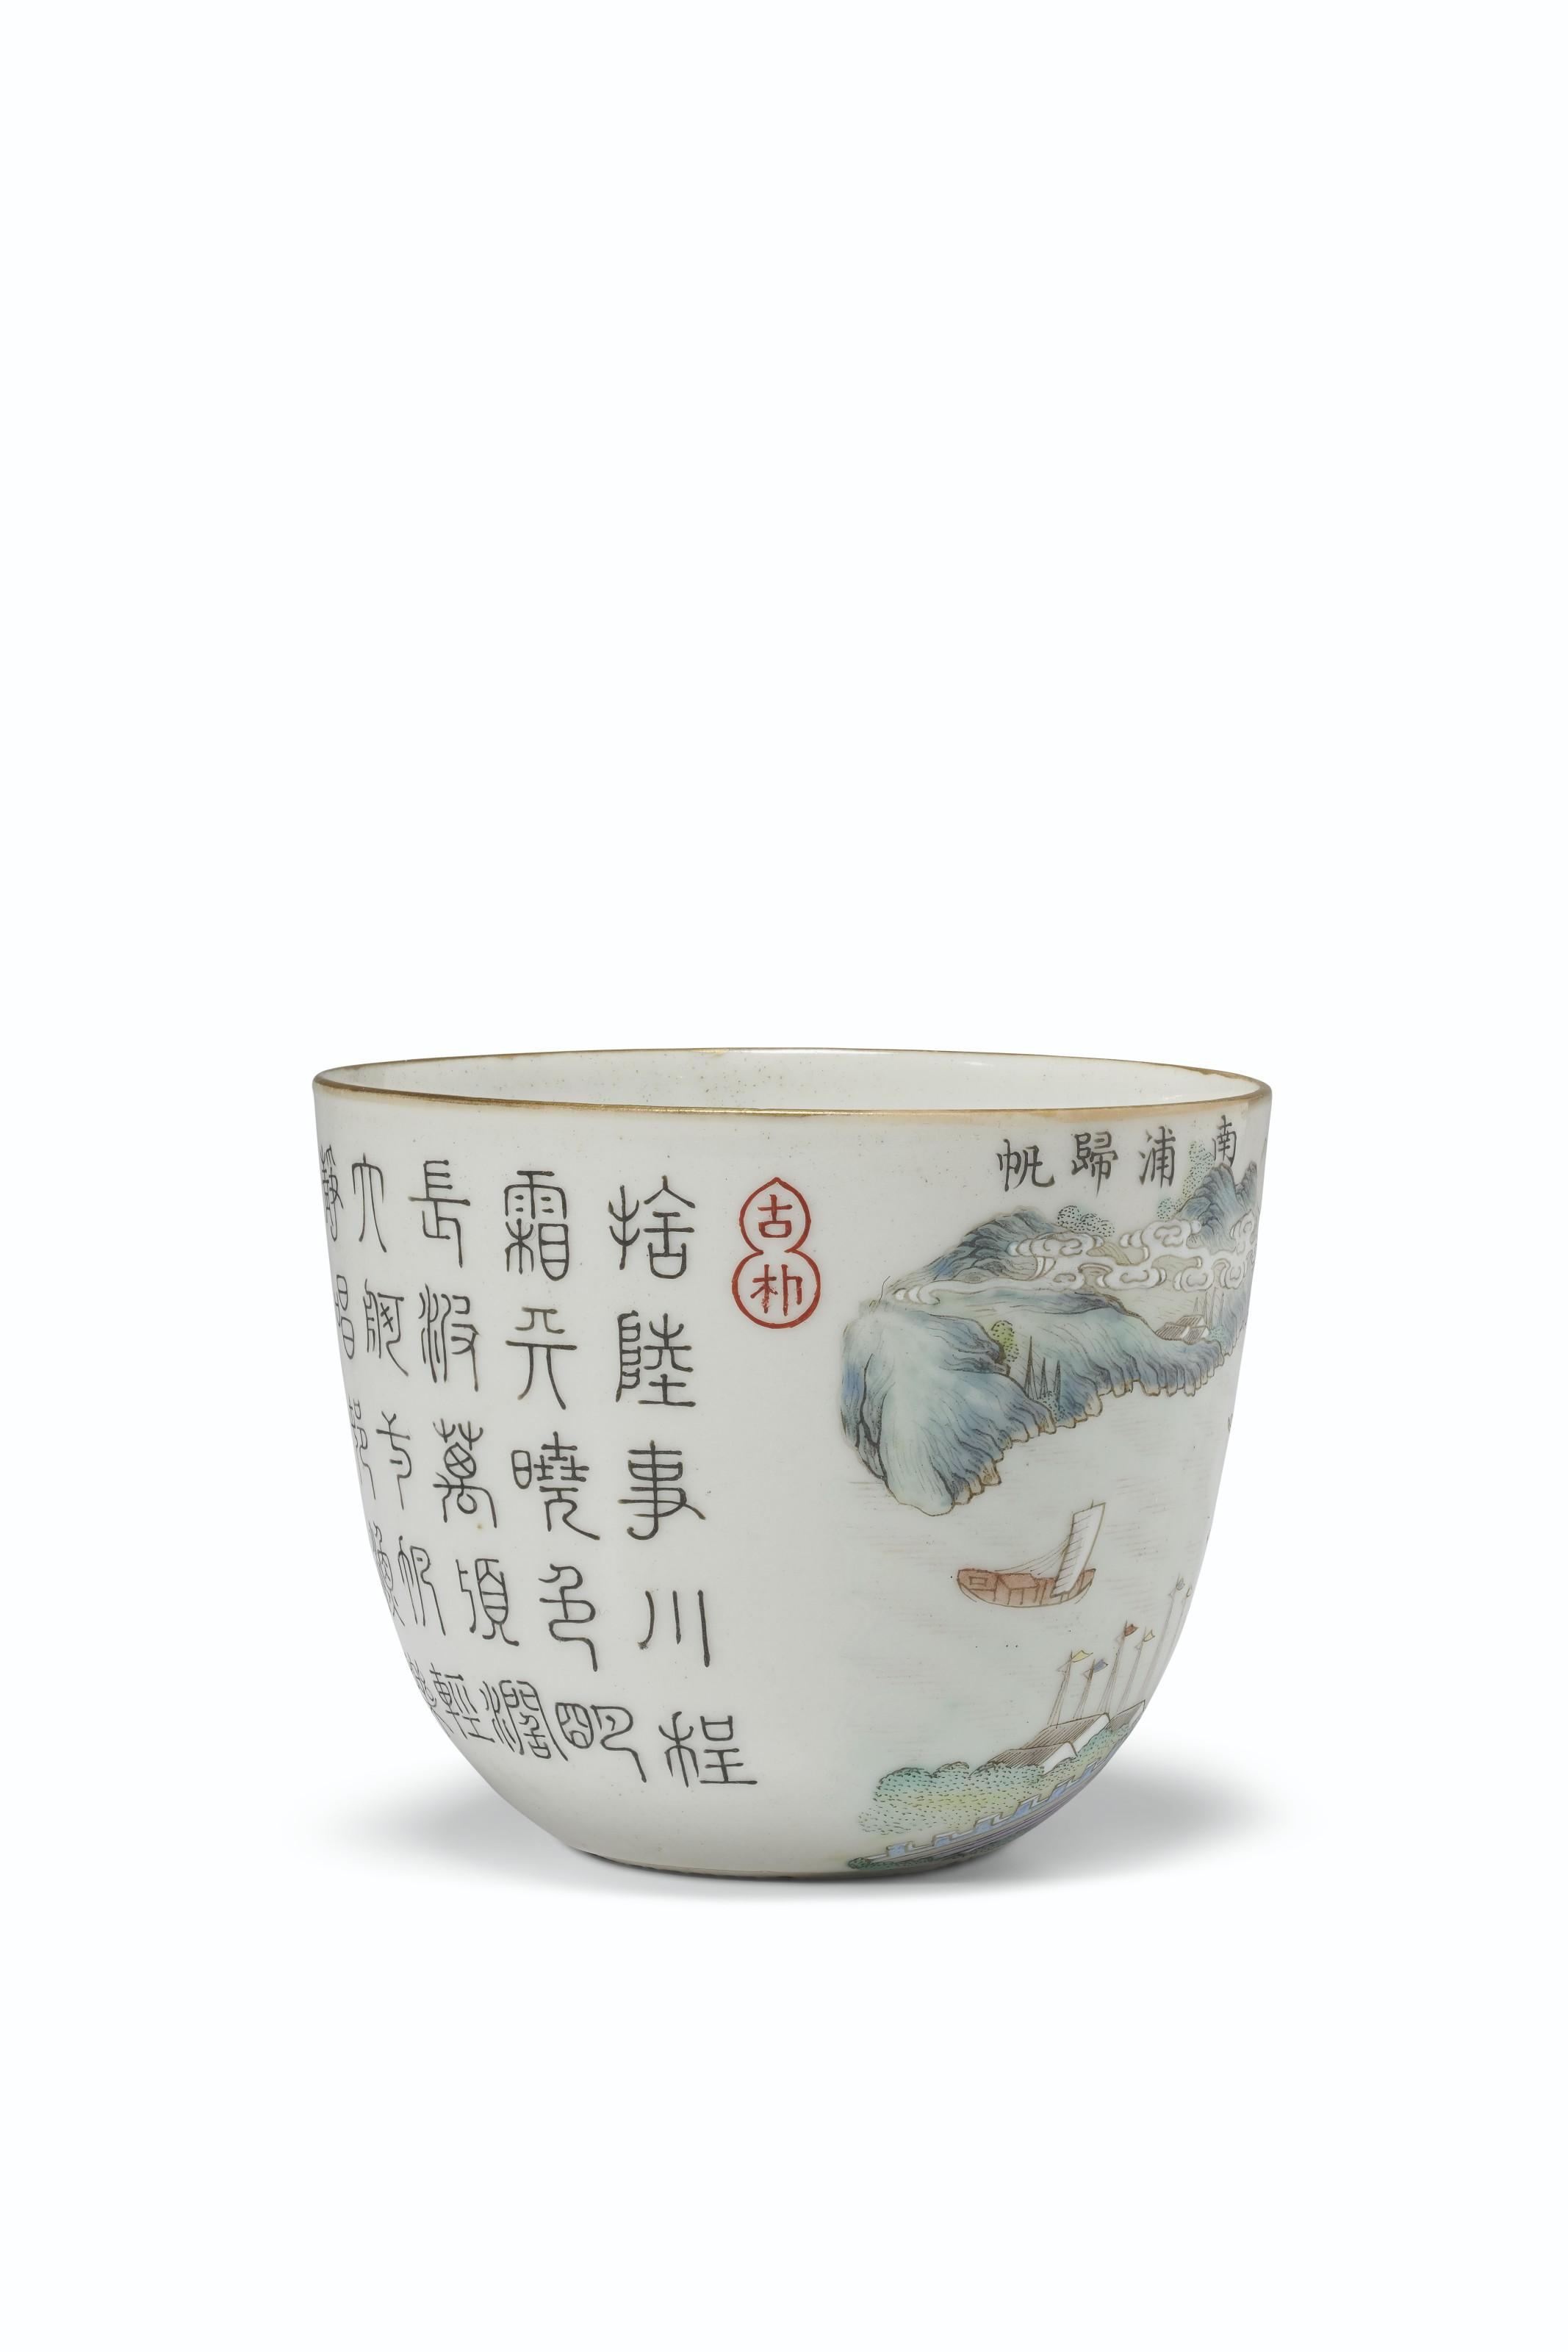 A FAMILLE ROSE 'LANDSCAPE' CUP